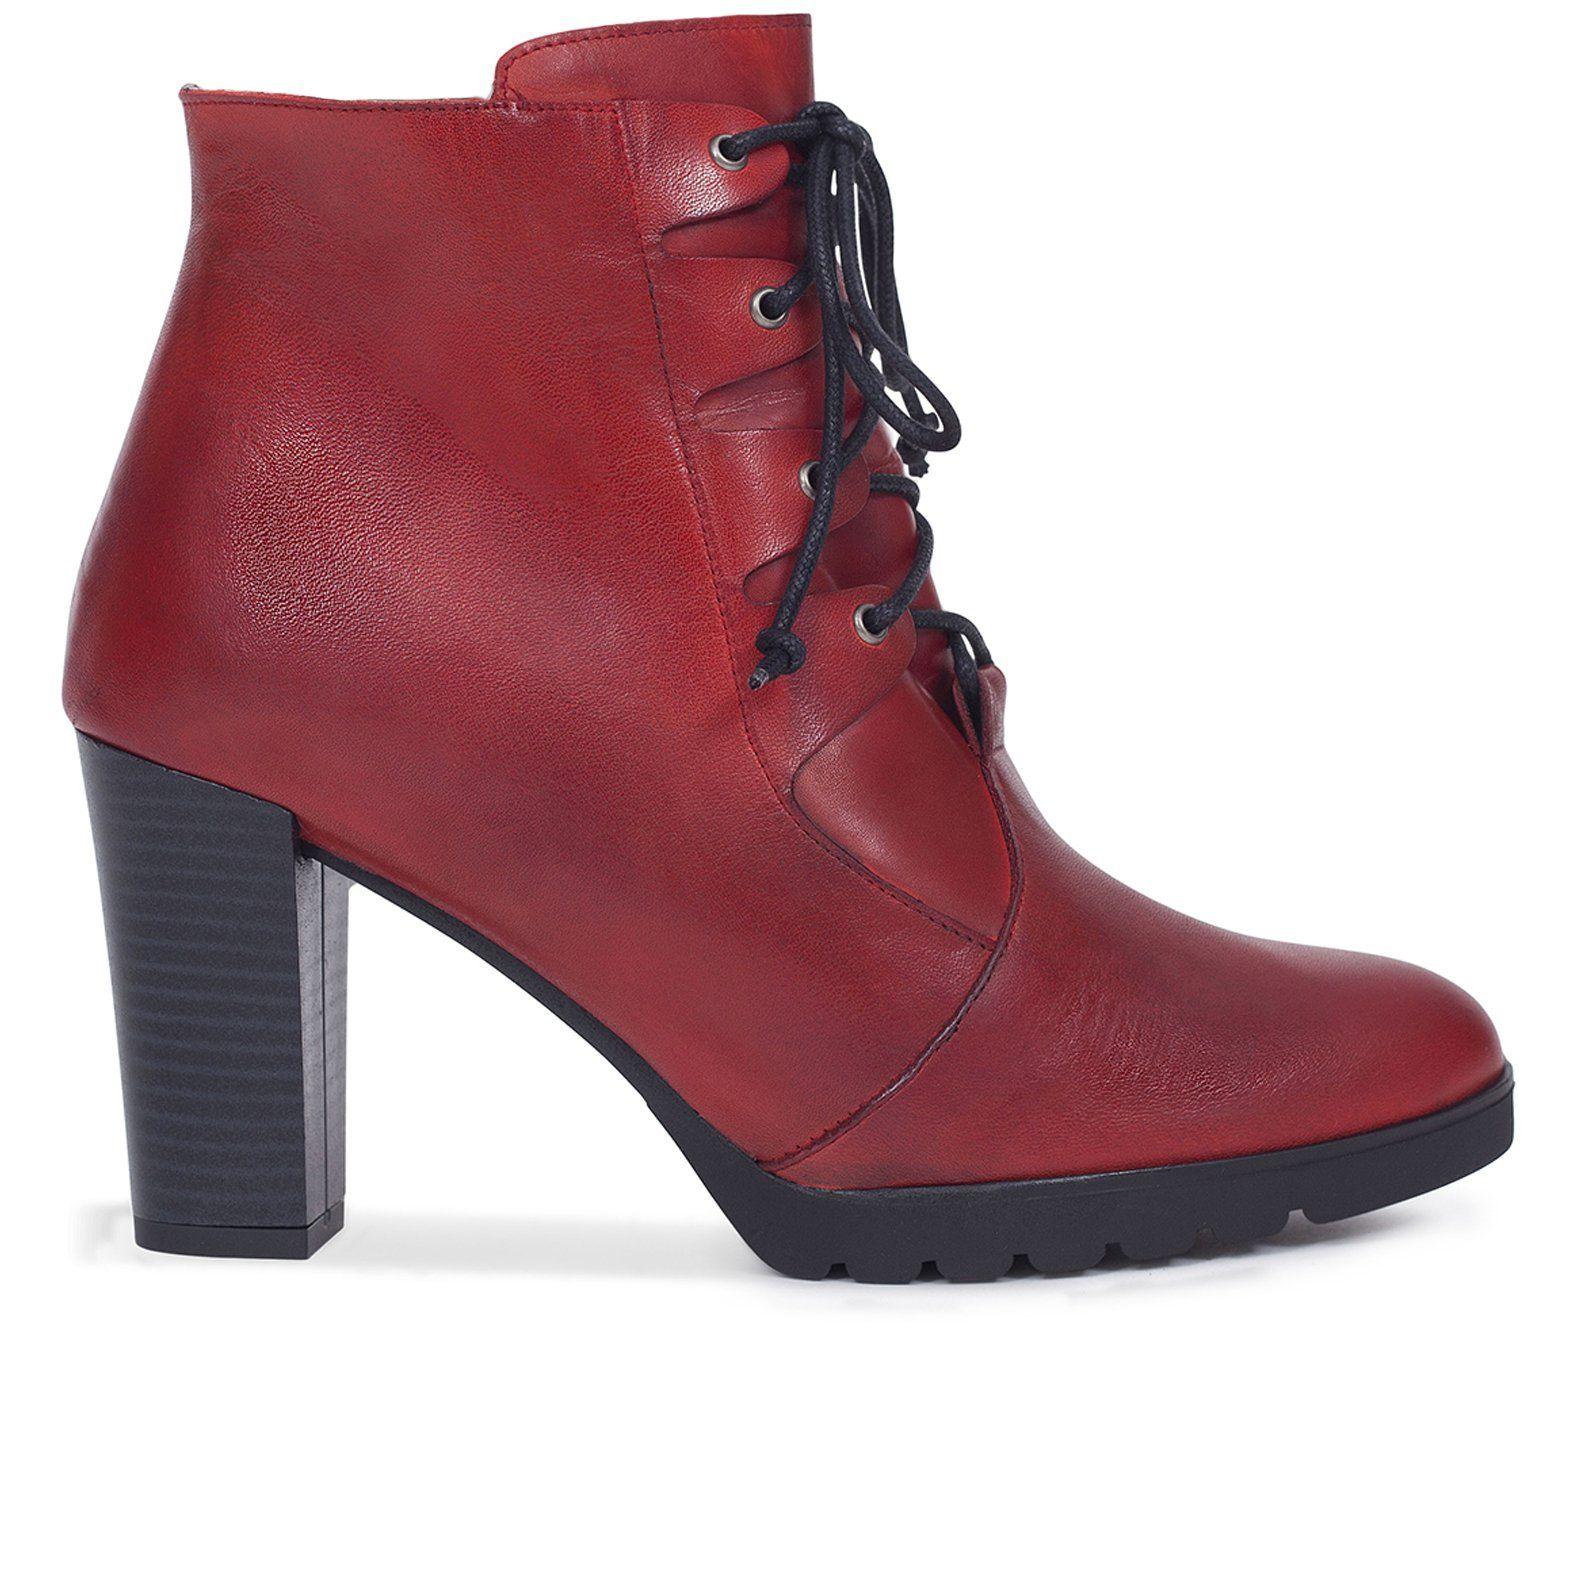 8e7096c5 Botin mujer ROJO con cordones – Zapatos miMaO Online – miMaO ShopOnline